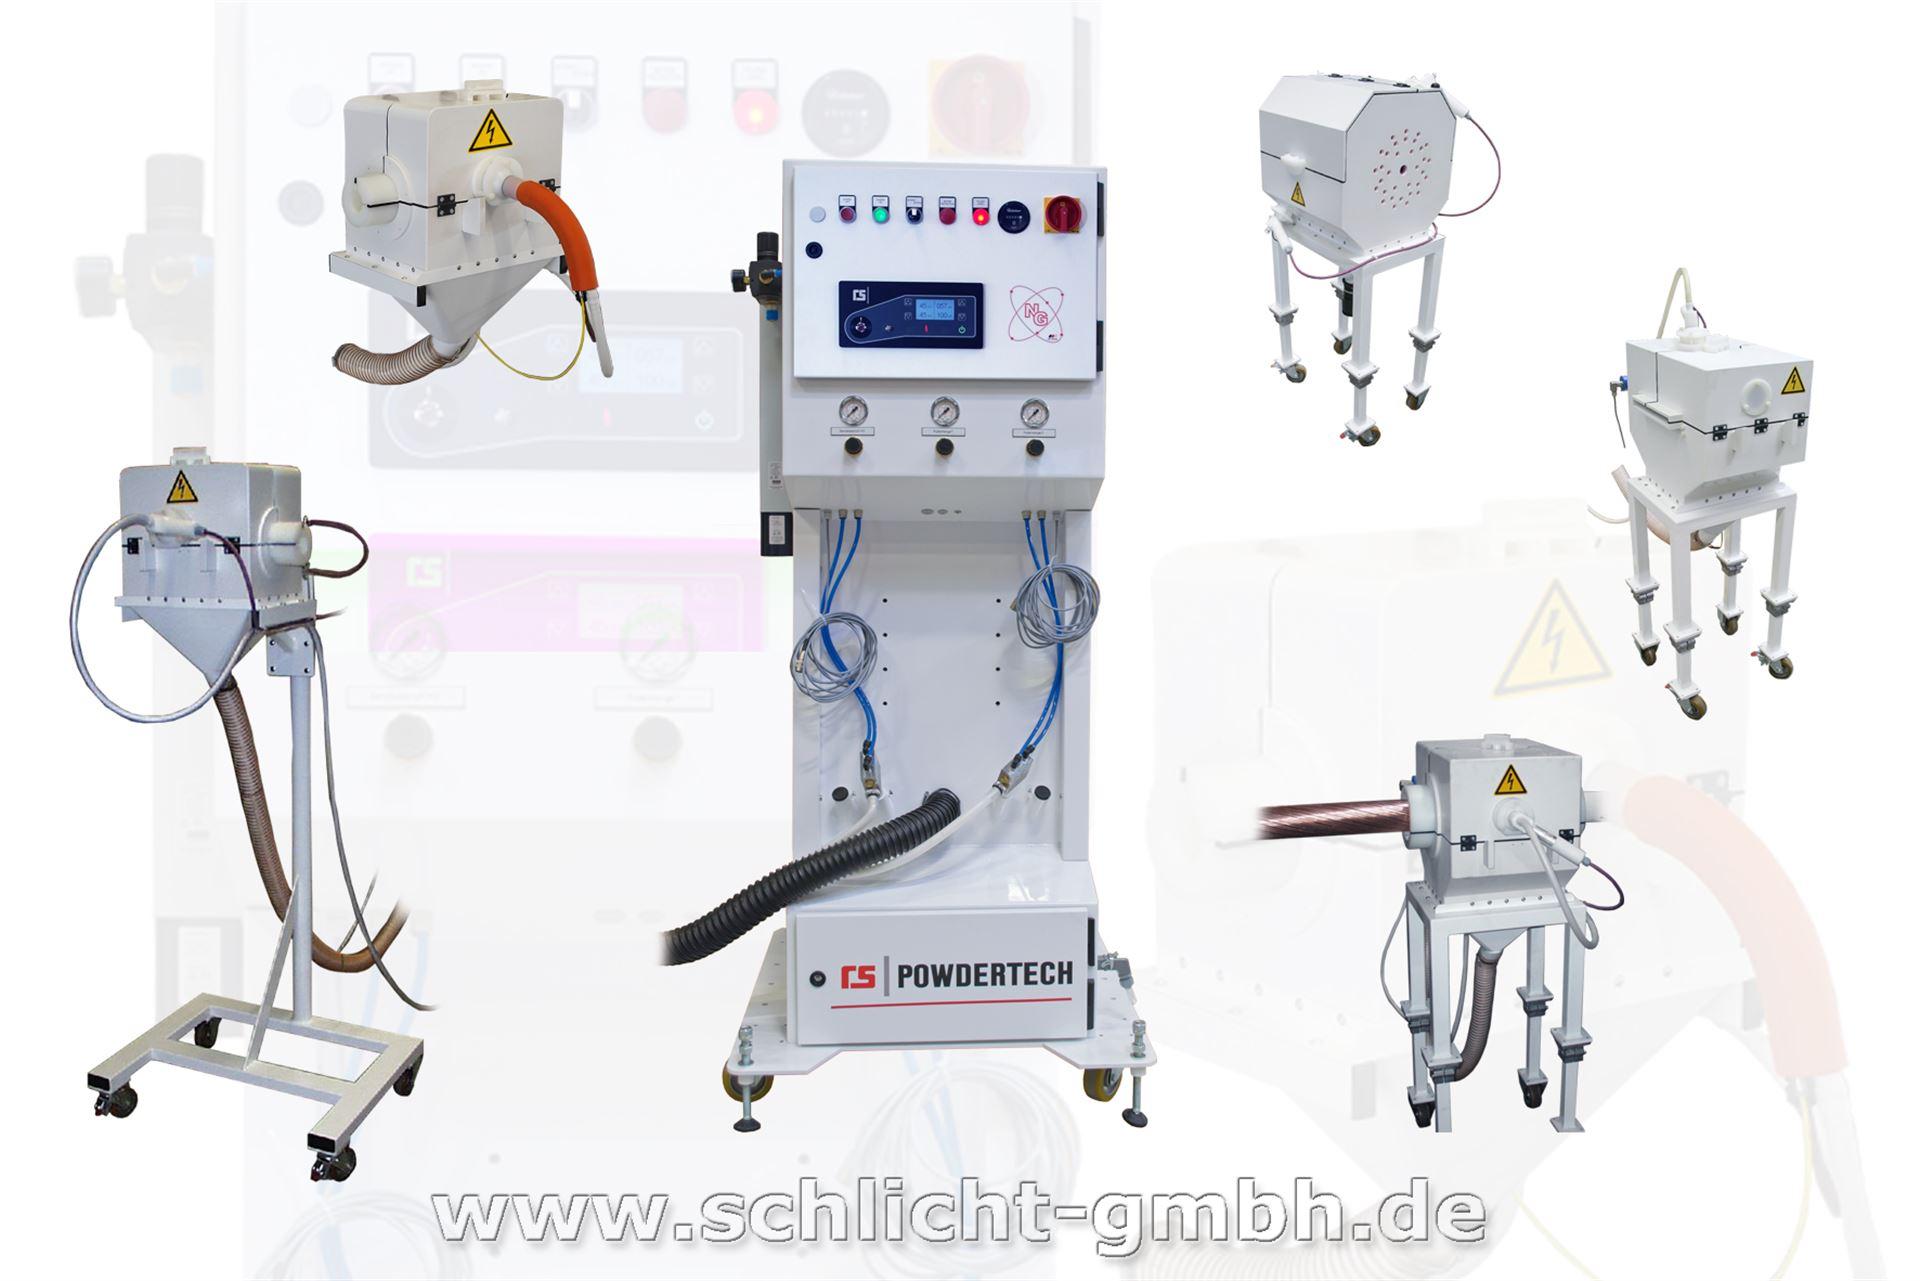 ROLF SCHLICHT GmbH - RS POWDERTECH Bepuderungsmaschine - Typ RSC NG